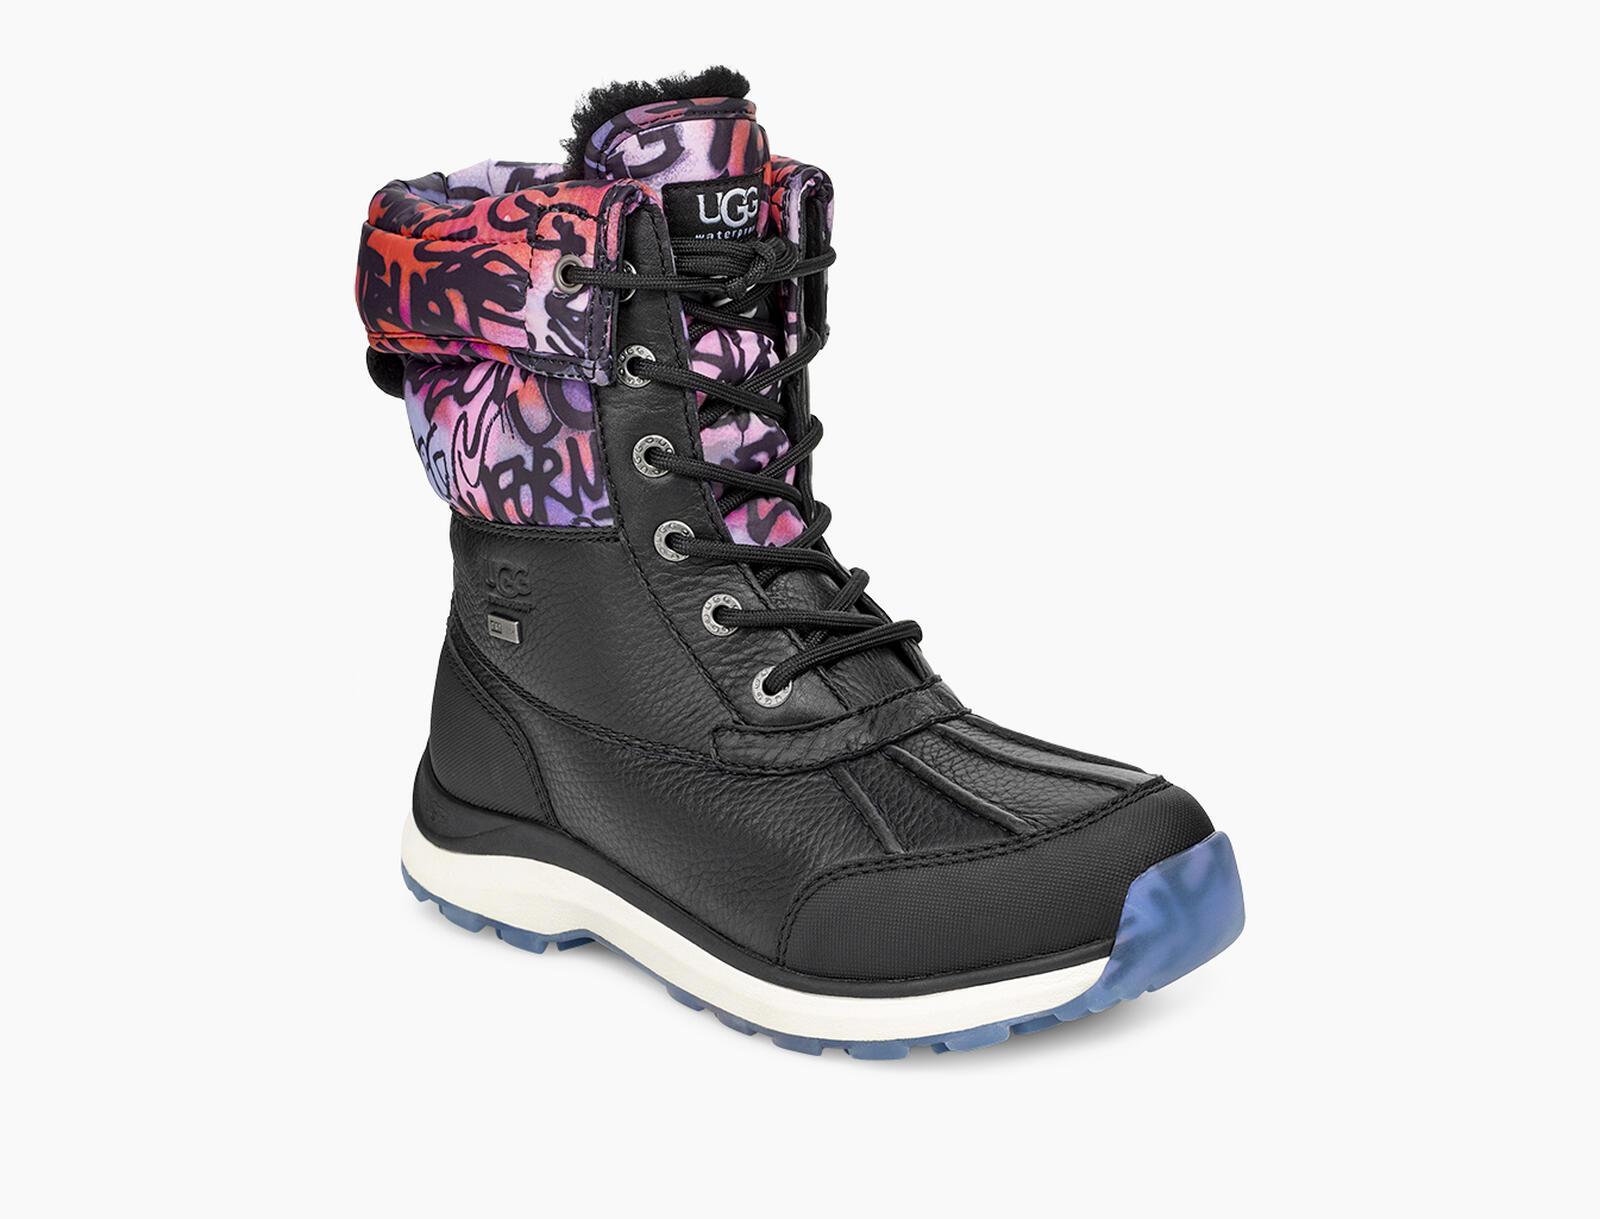 Adirondack III Graffiti Boot